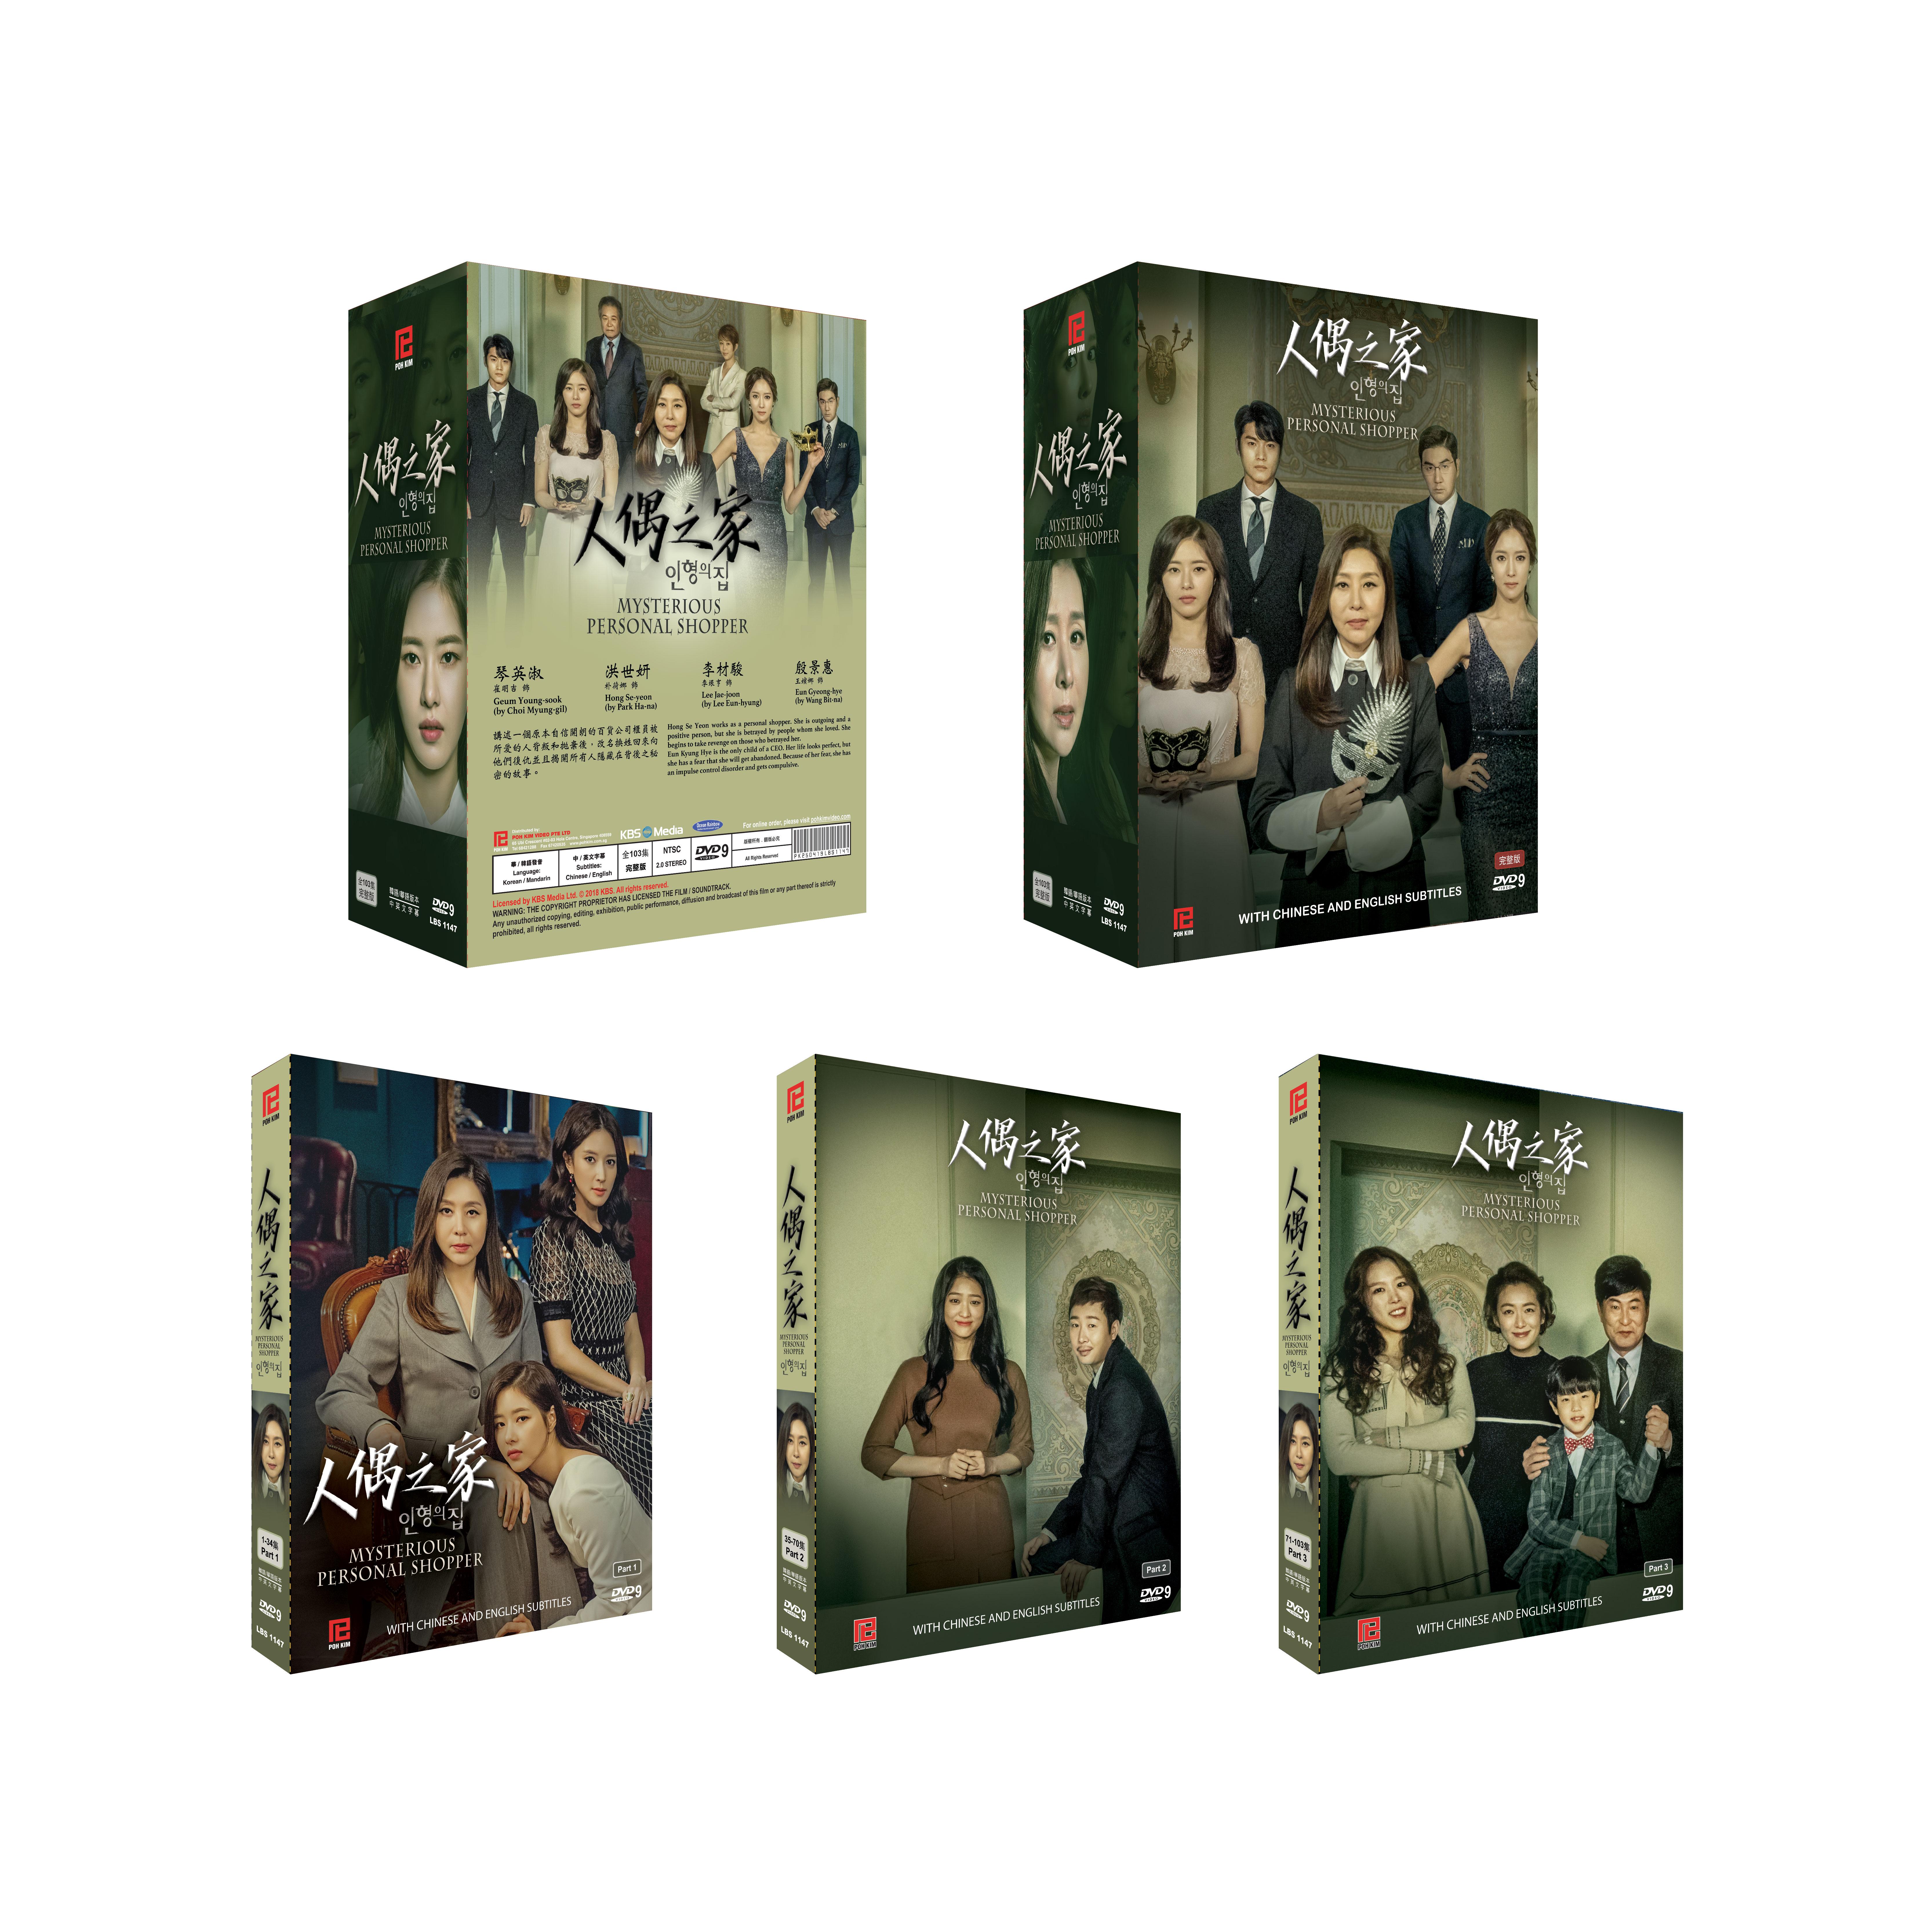 Mysterious Personal Shopper 인형의 집 人偶之家 (Korean Drama DVD)